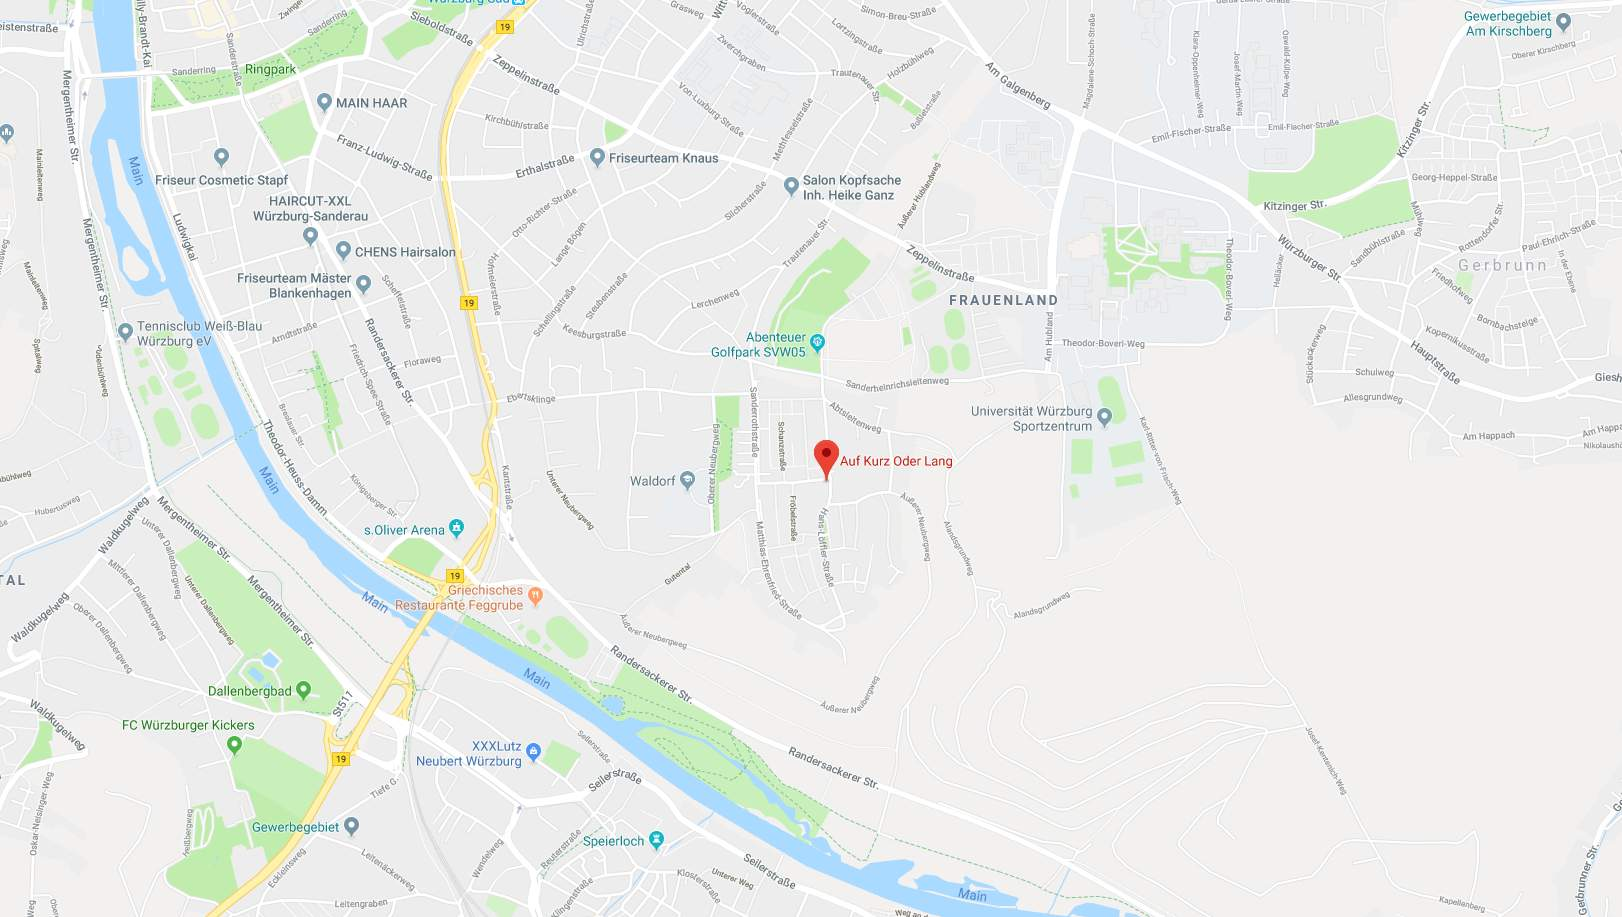 akol_map